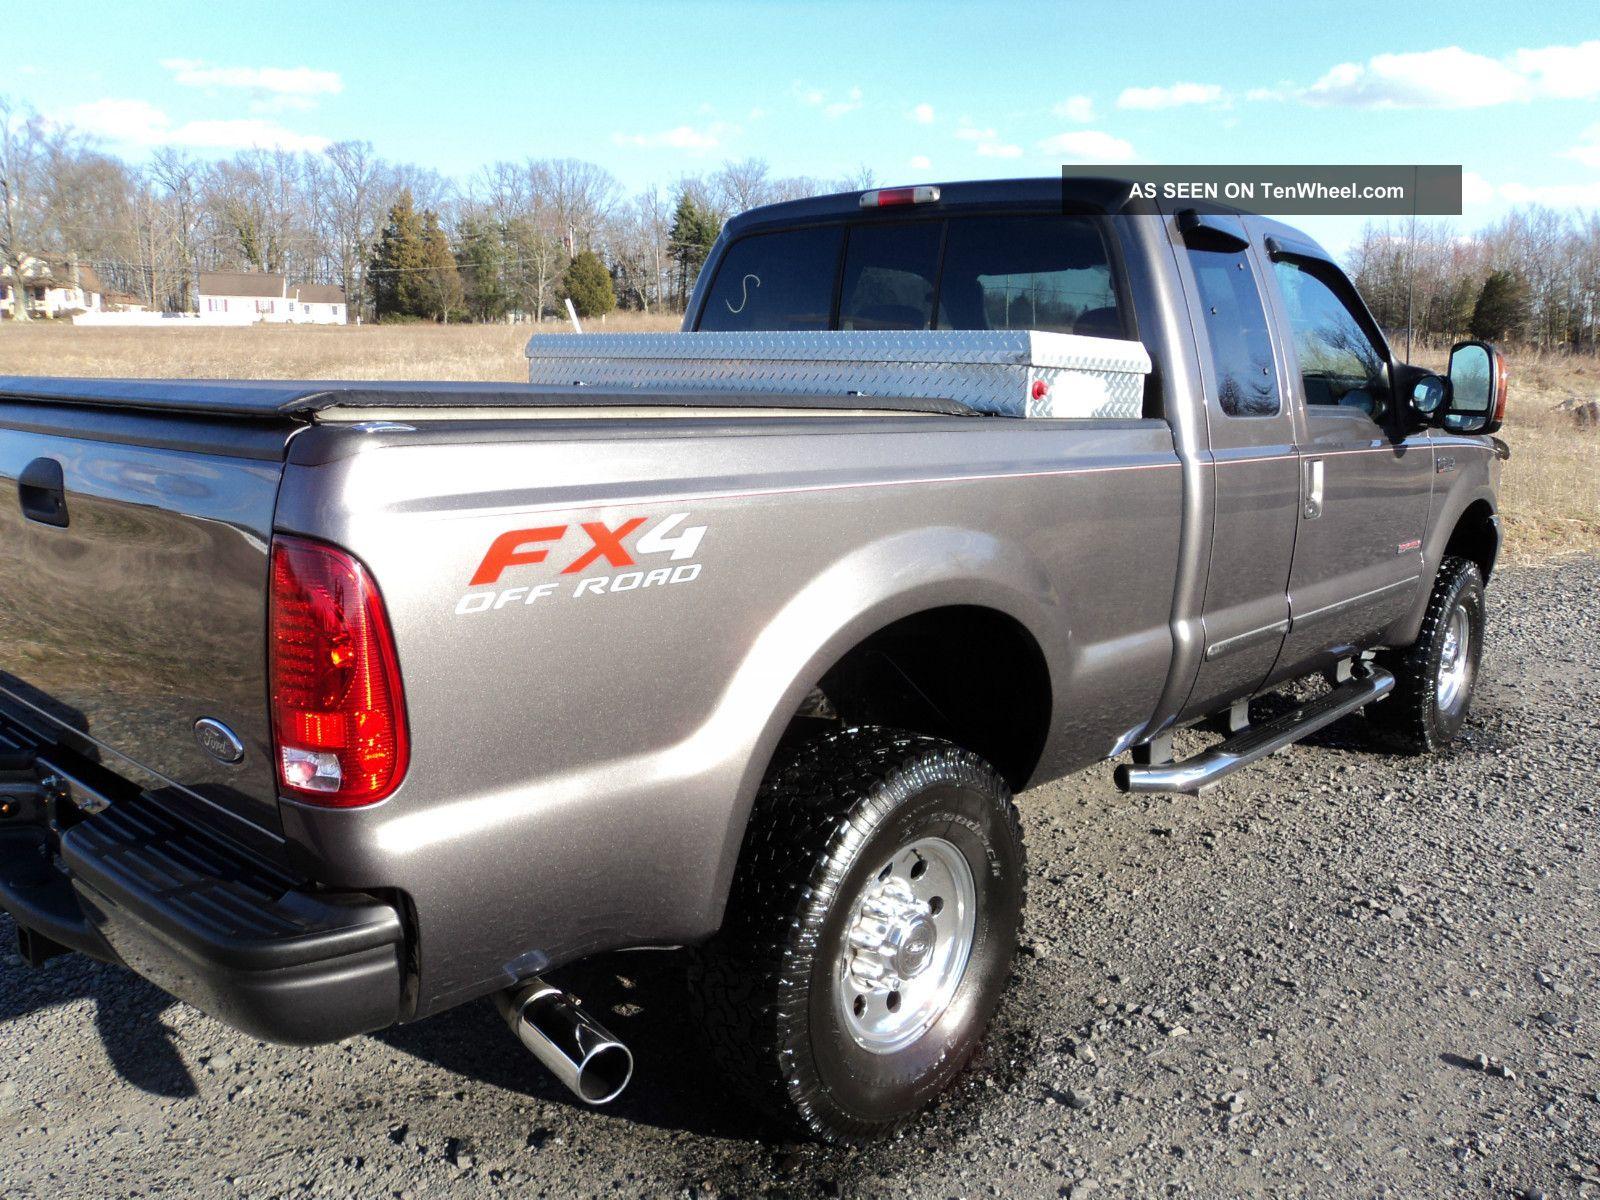 2003 Ford F250 Powerstroke Diesel Fx4 Ext Cab 4x4  16900